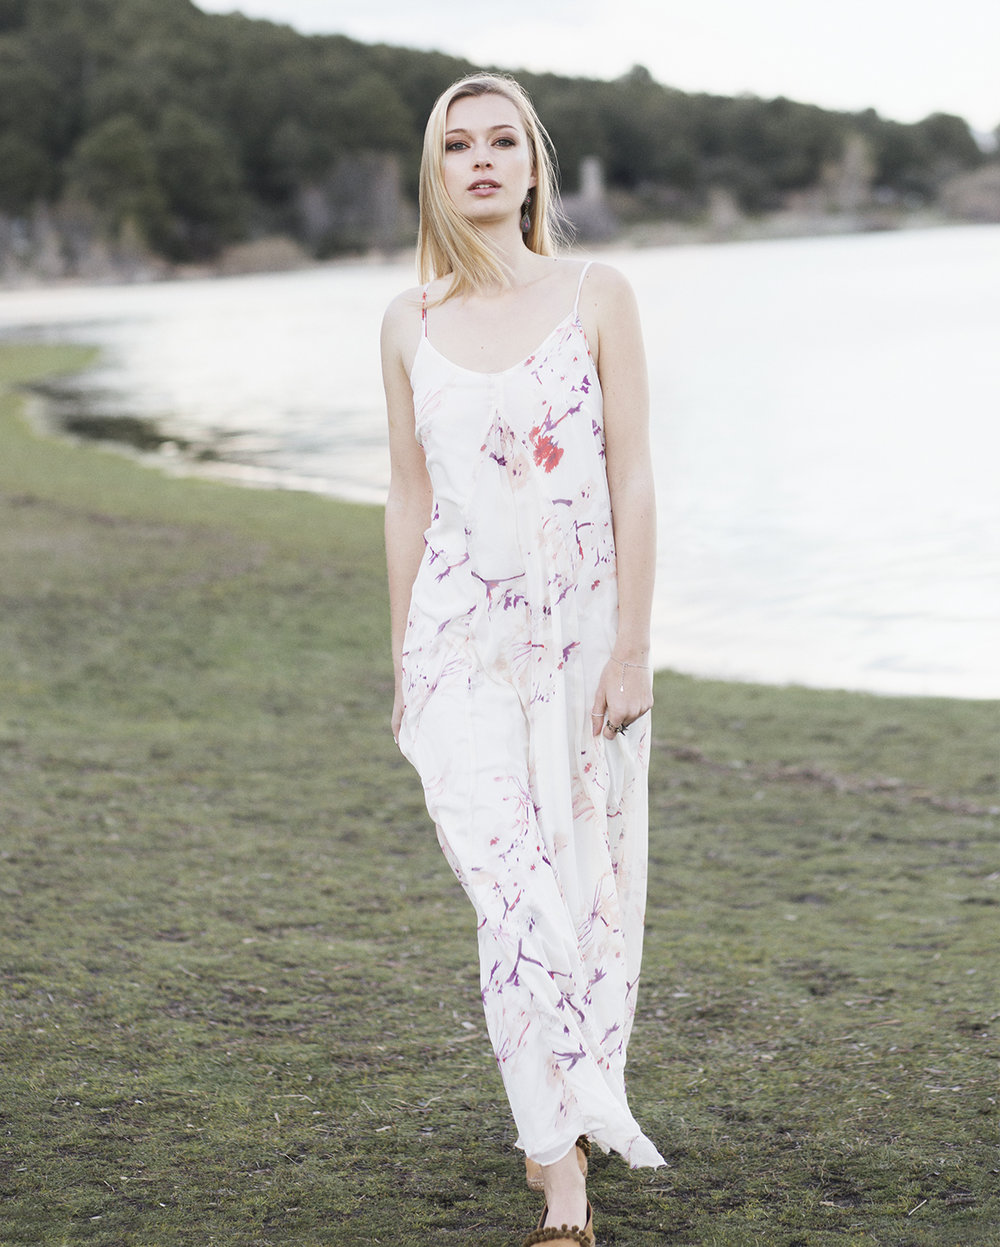 Long floral print dress- Kling Brown suede espadrilles- Aedo Pendientes- Sandra Palomar Rings- Roberto Navazo